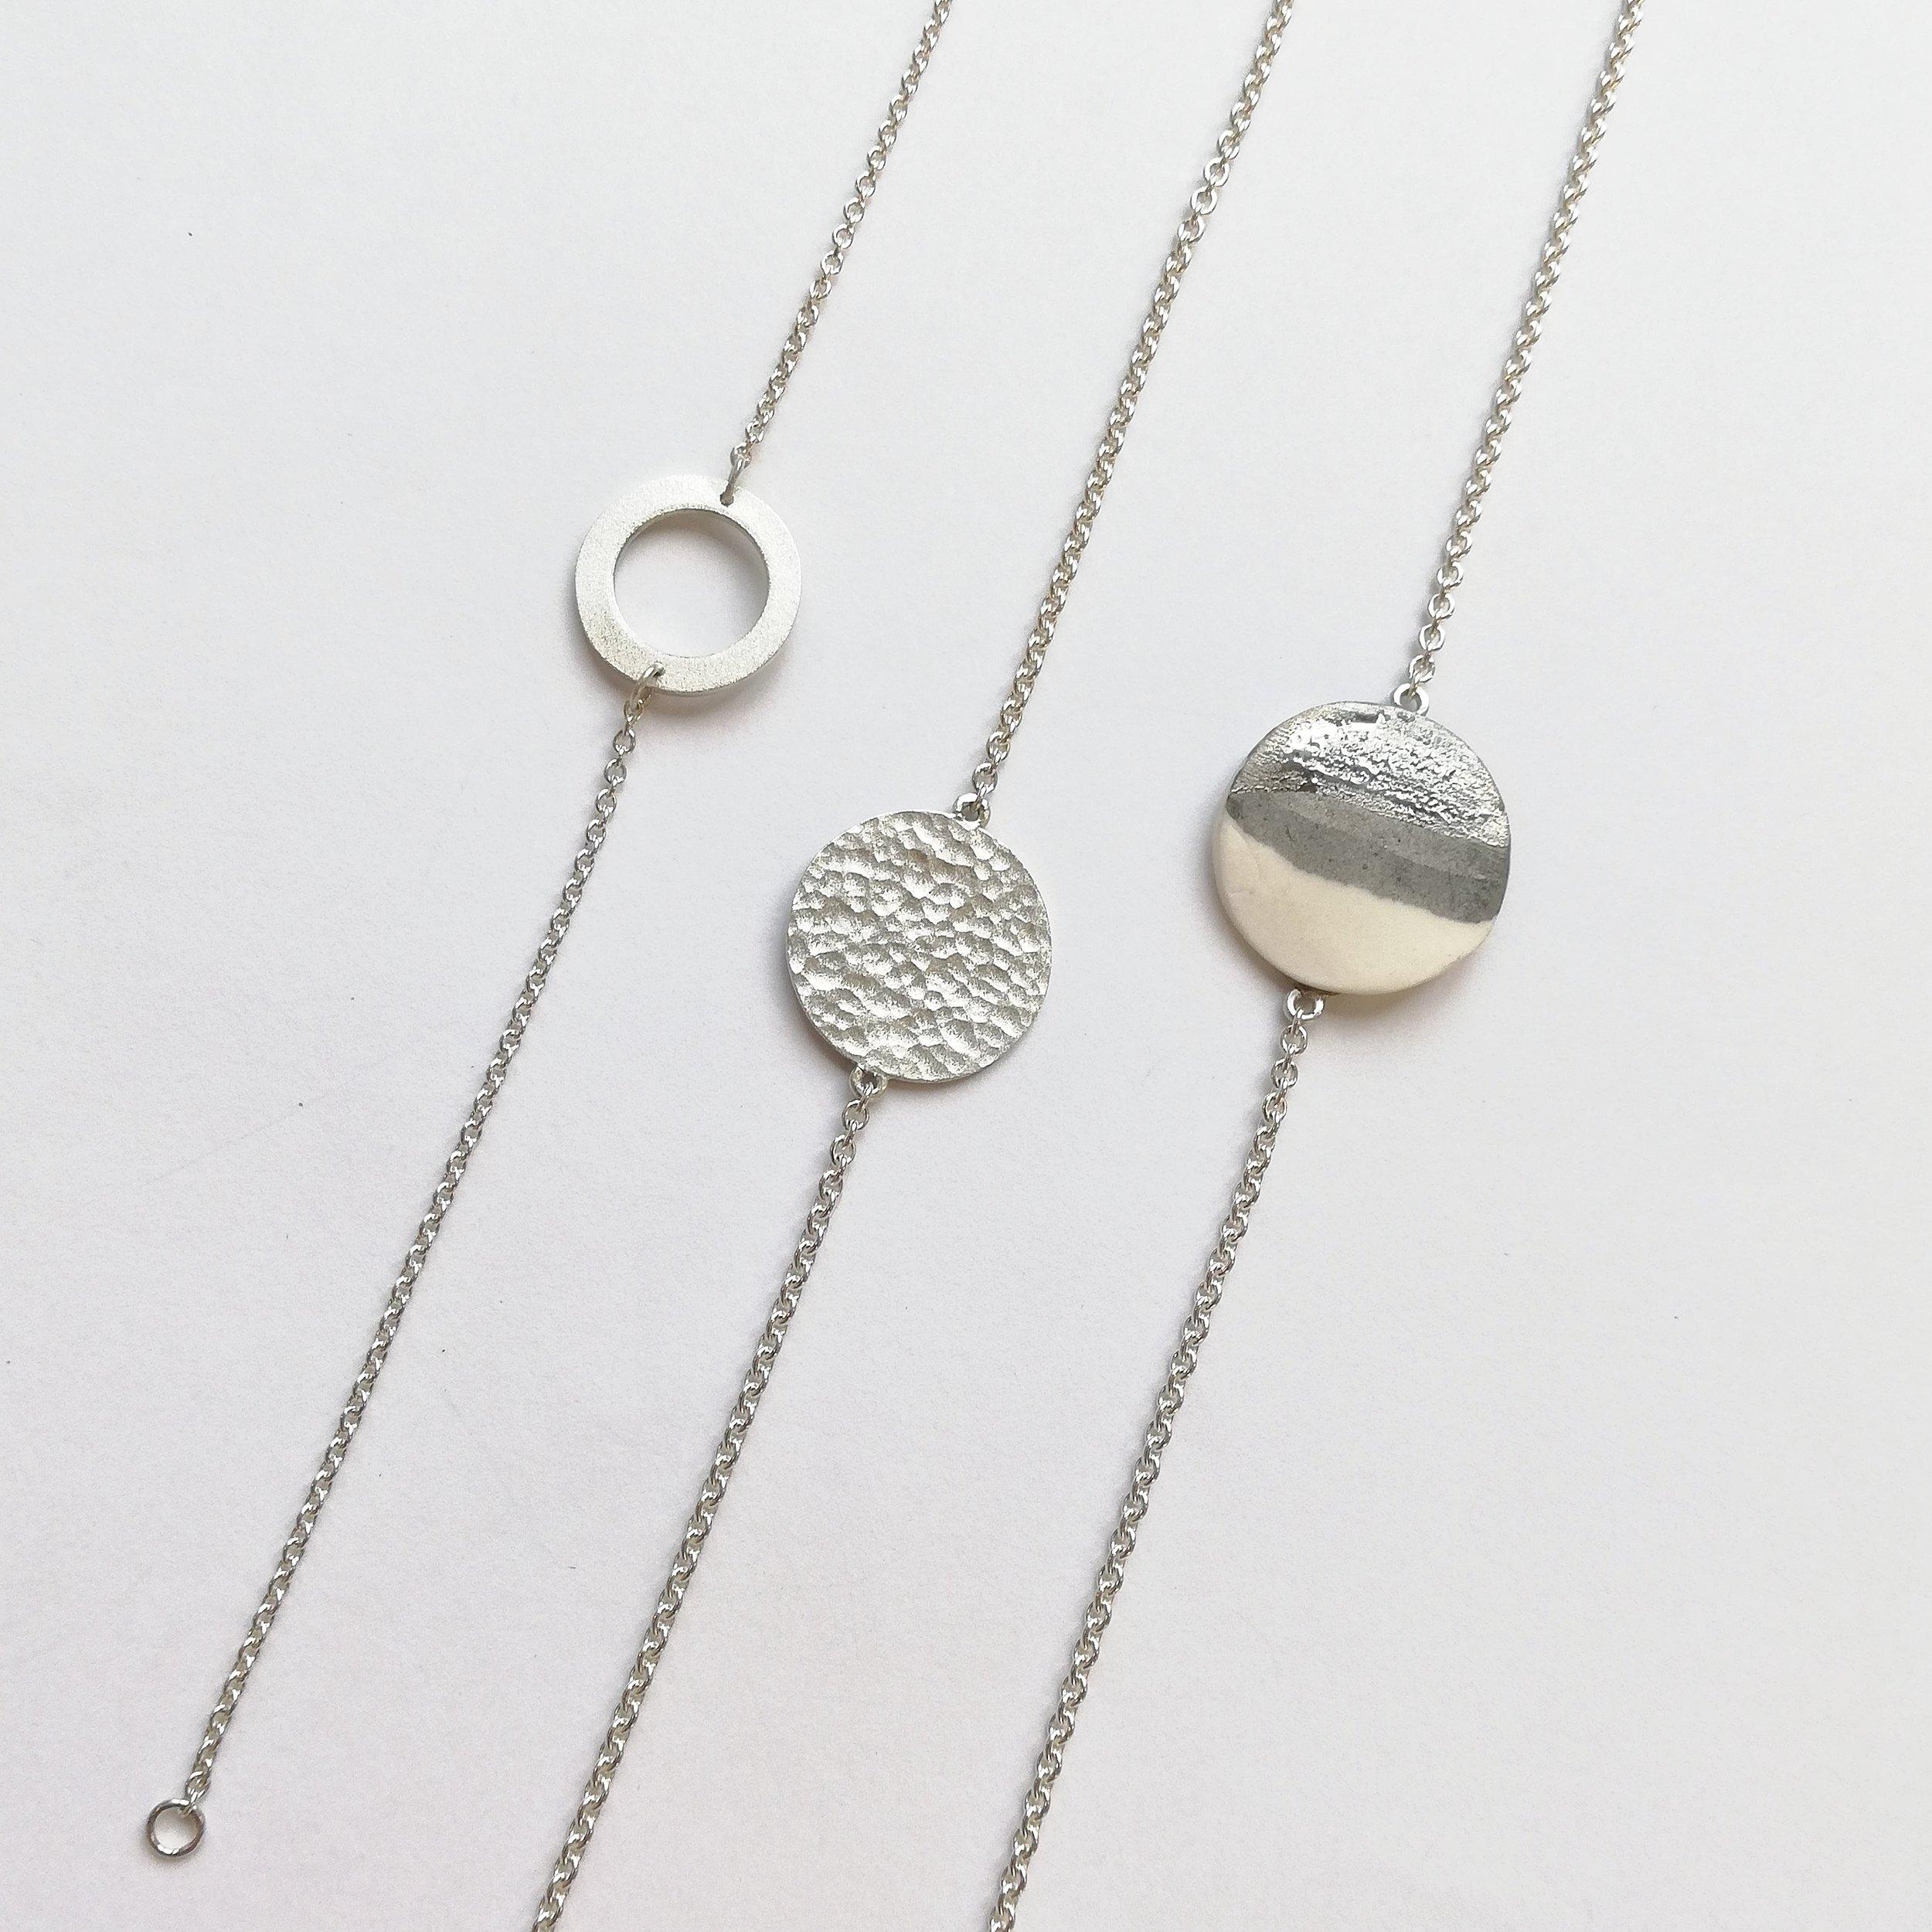 Armband No.2 - Links: Silber 925 / Fr. 65.00Mitte: Silber 925 / Fr. 70.00Rechts: Porzellan mit Platindekor / Silber 925 /Fr. 78.00